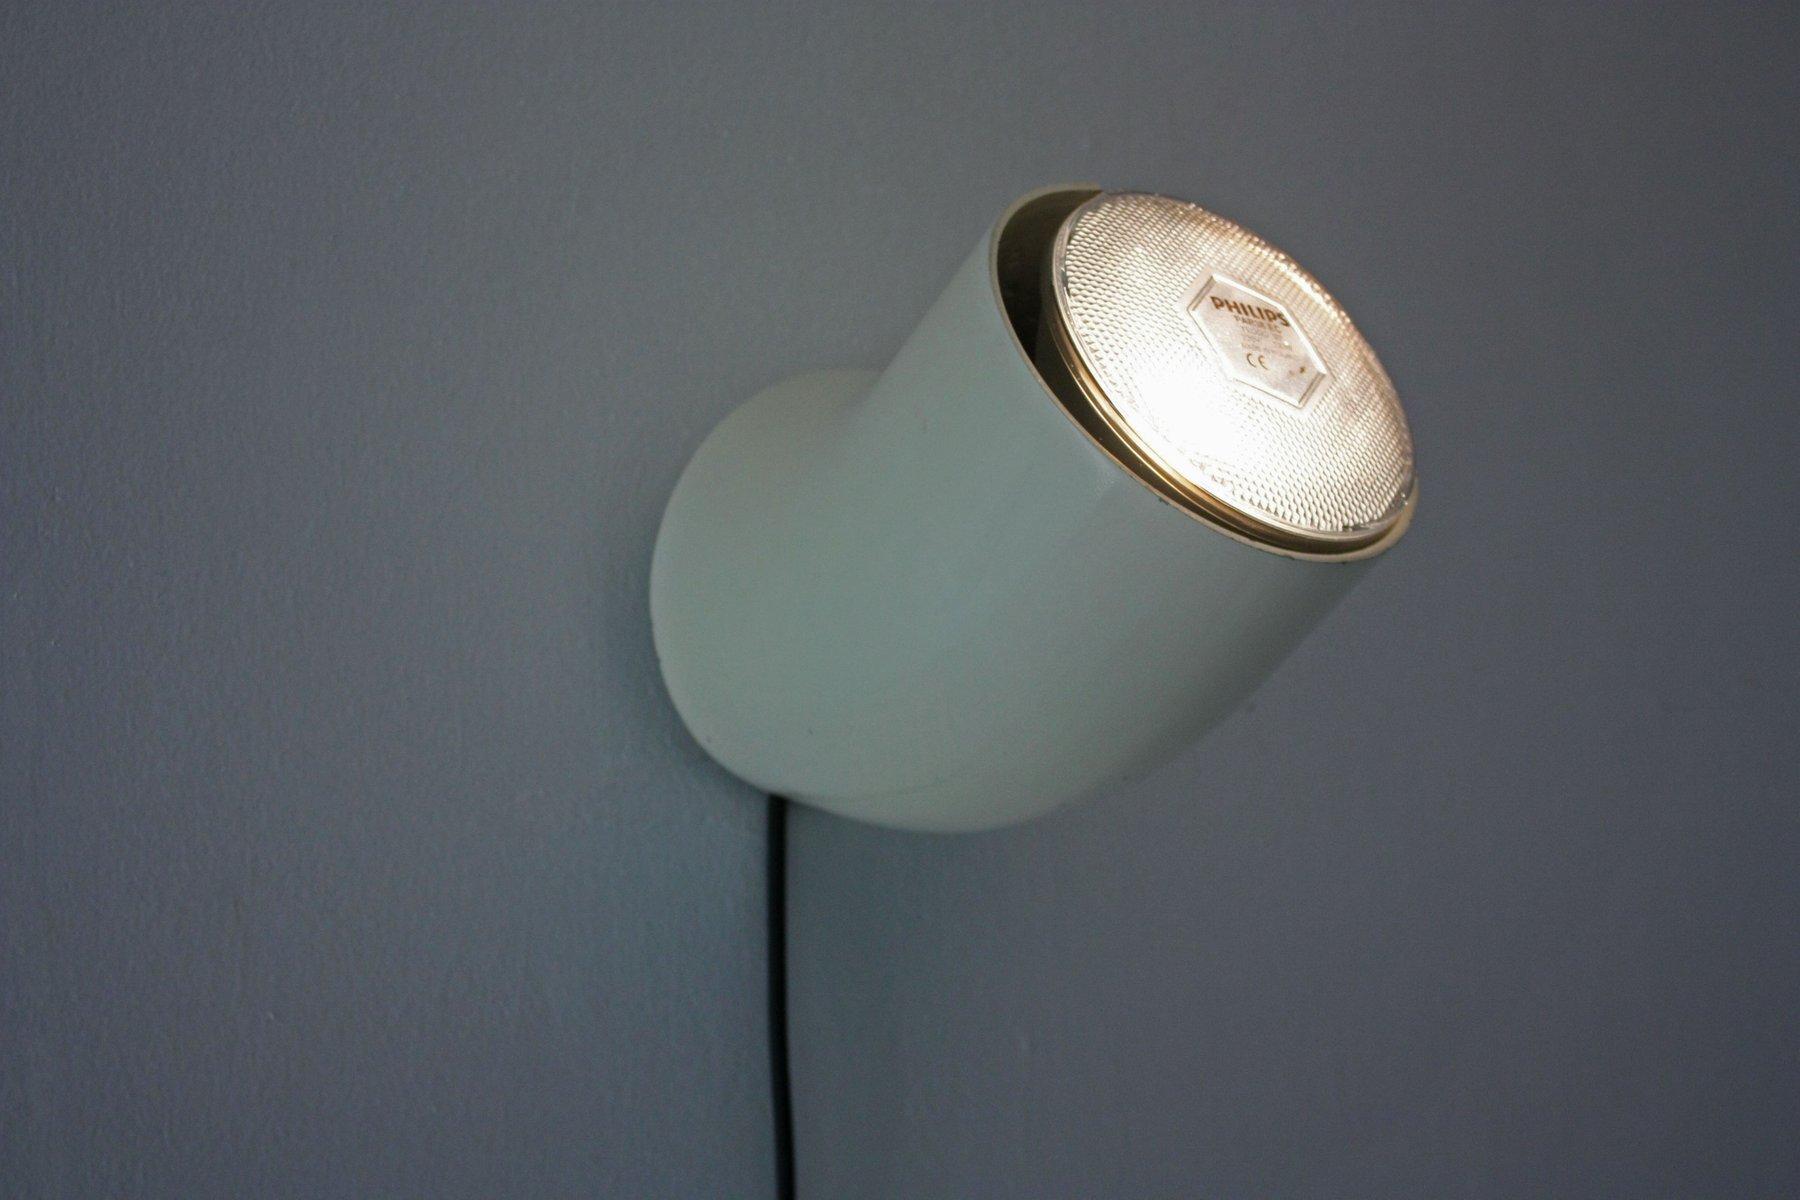 Modell A19 Wandlampe von Alain Richard für Disderot, 1960er